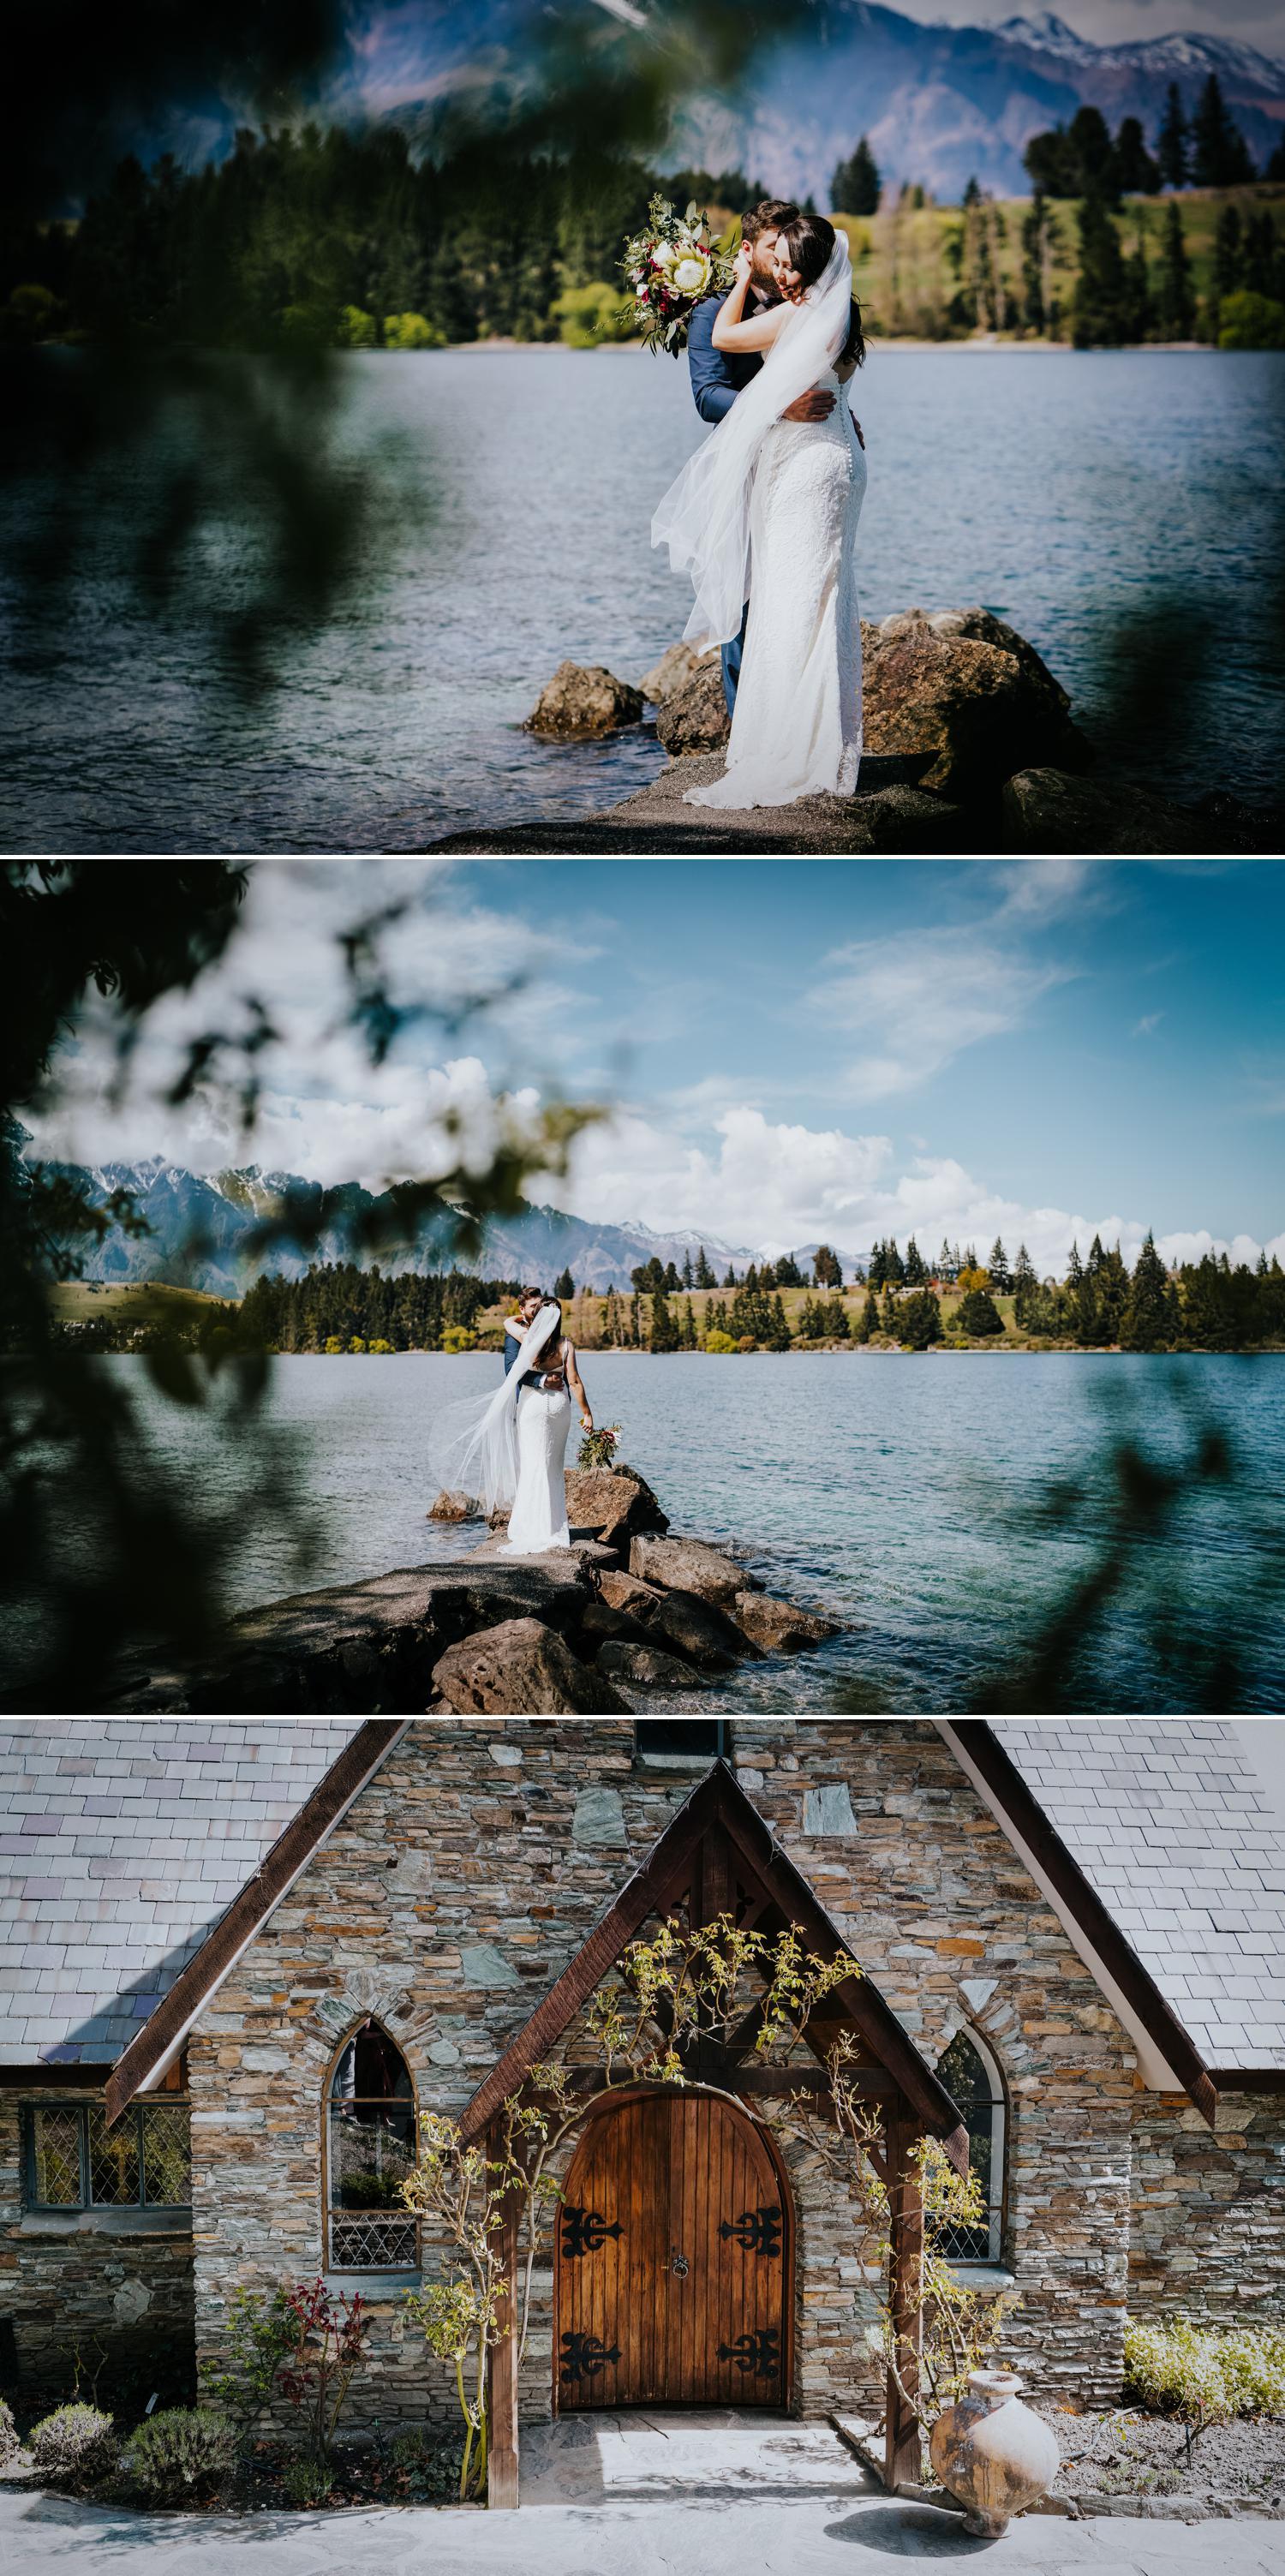 Lakeside wedding photos queenstown